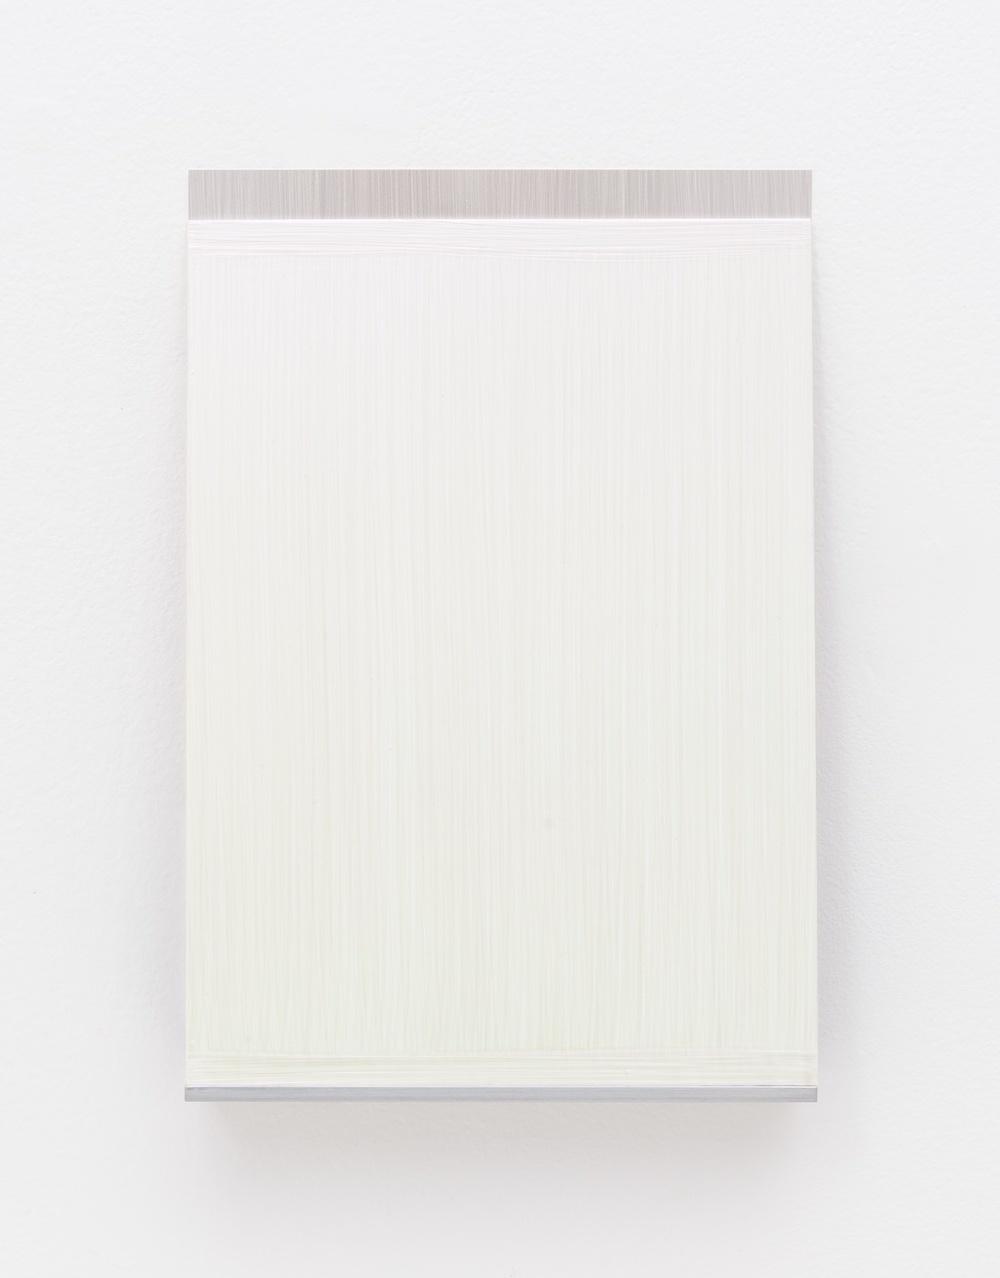 "Imi Knoebel An Meine Grüne Seite C 13-1 2012 Acrylic on aluminum, acrylic on plastic film, aluminum shelf 7 5/6"" x 7 1/12"" x 1 9/16"" IK006"